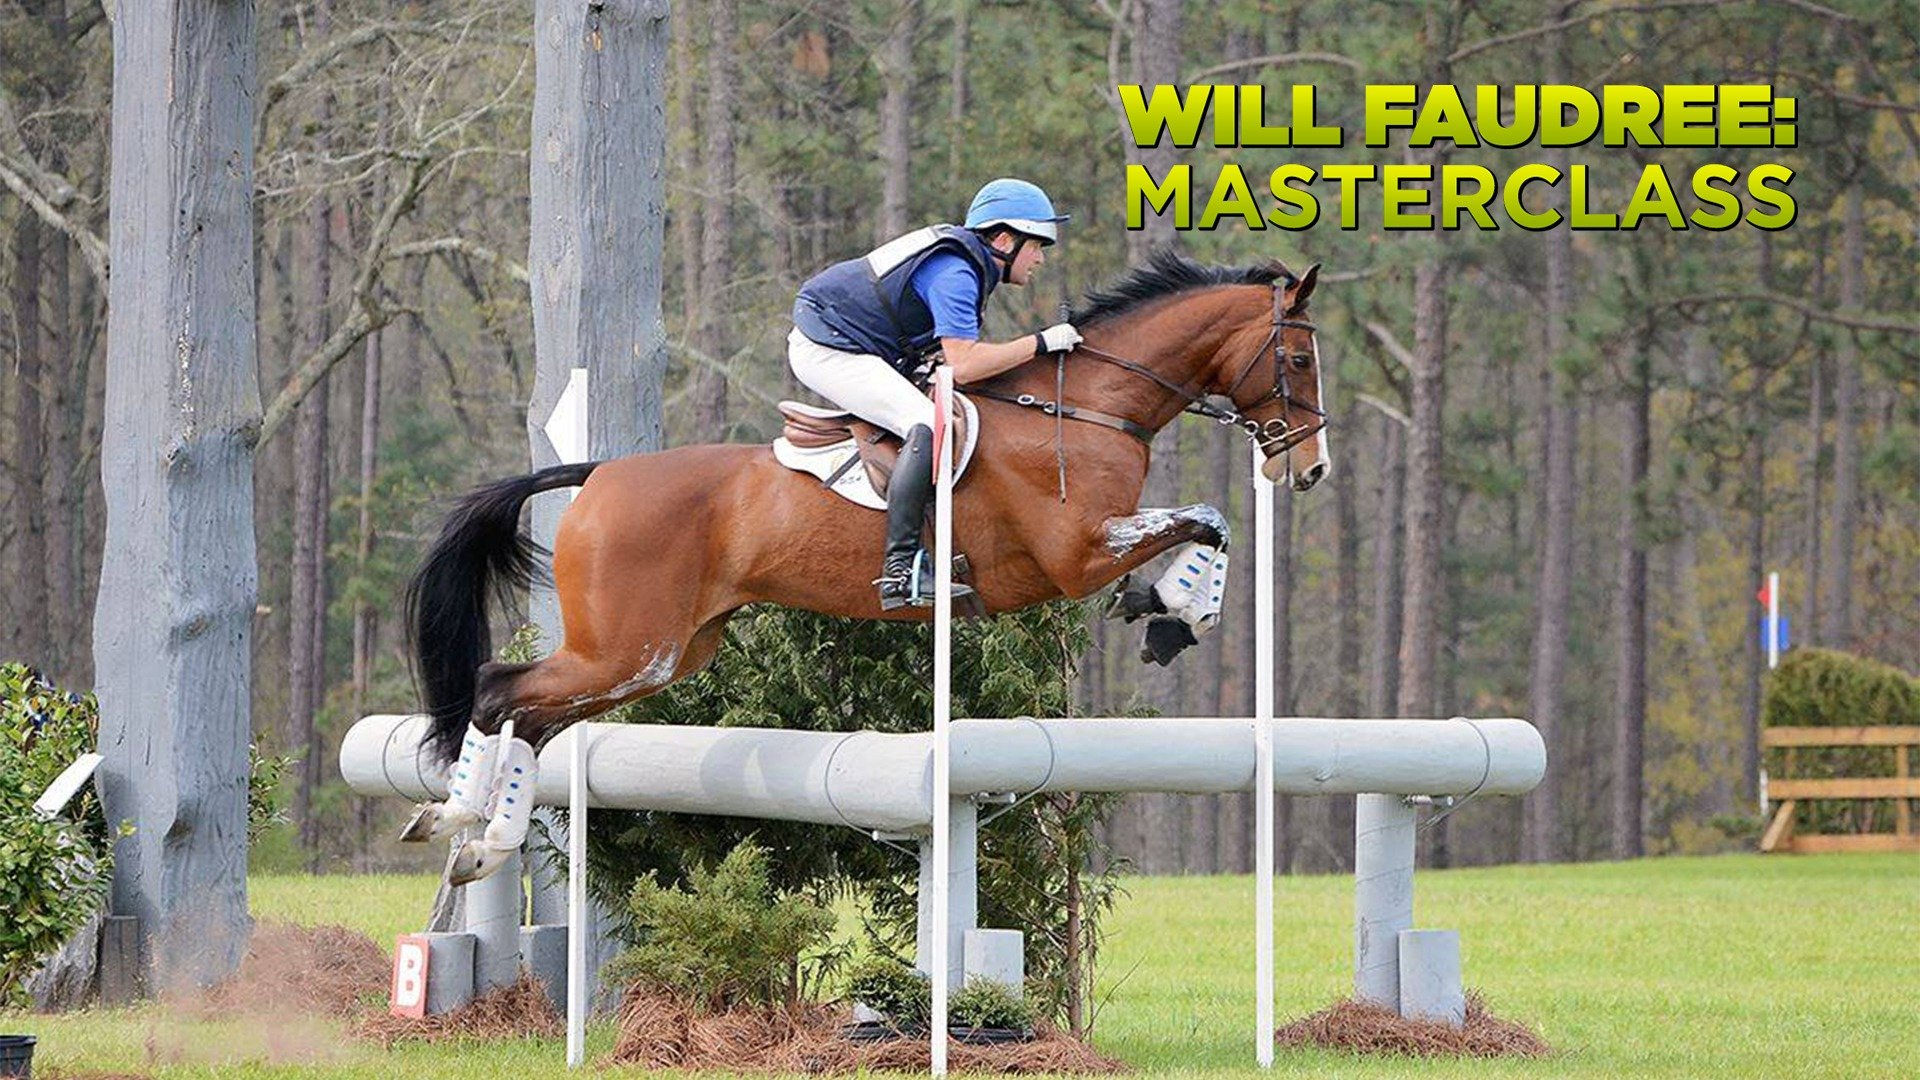 Will Faudree: Masterclass